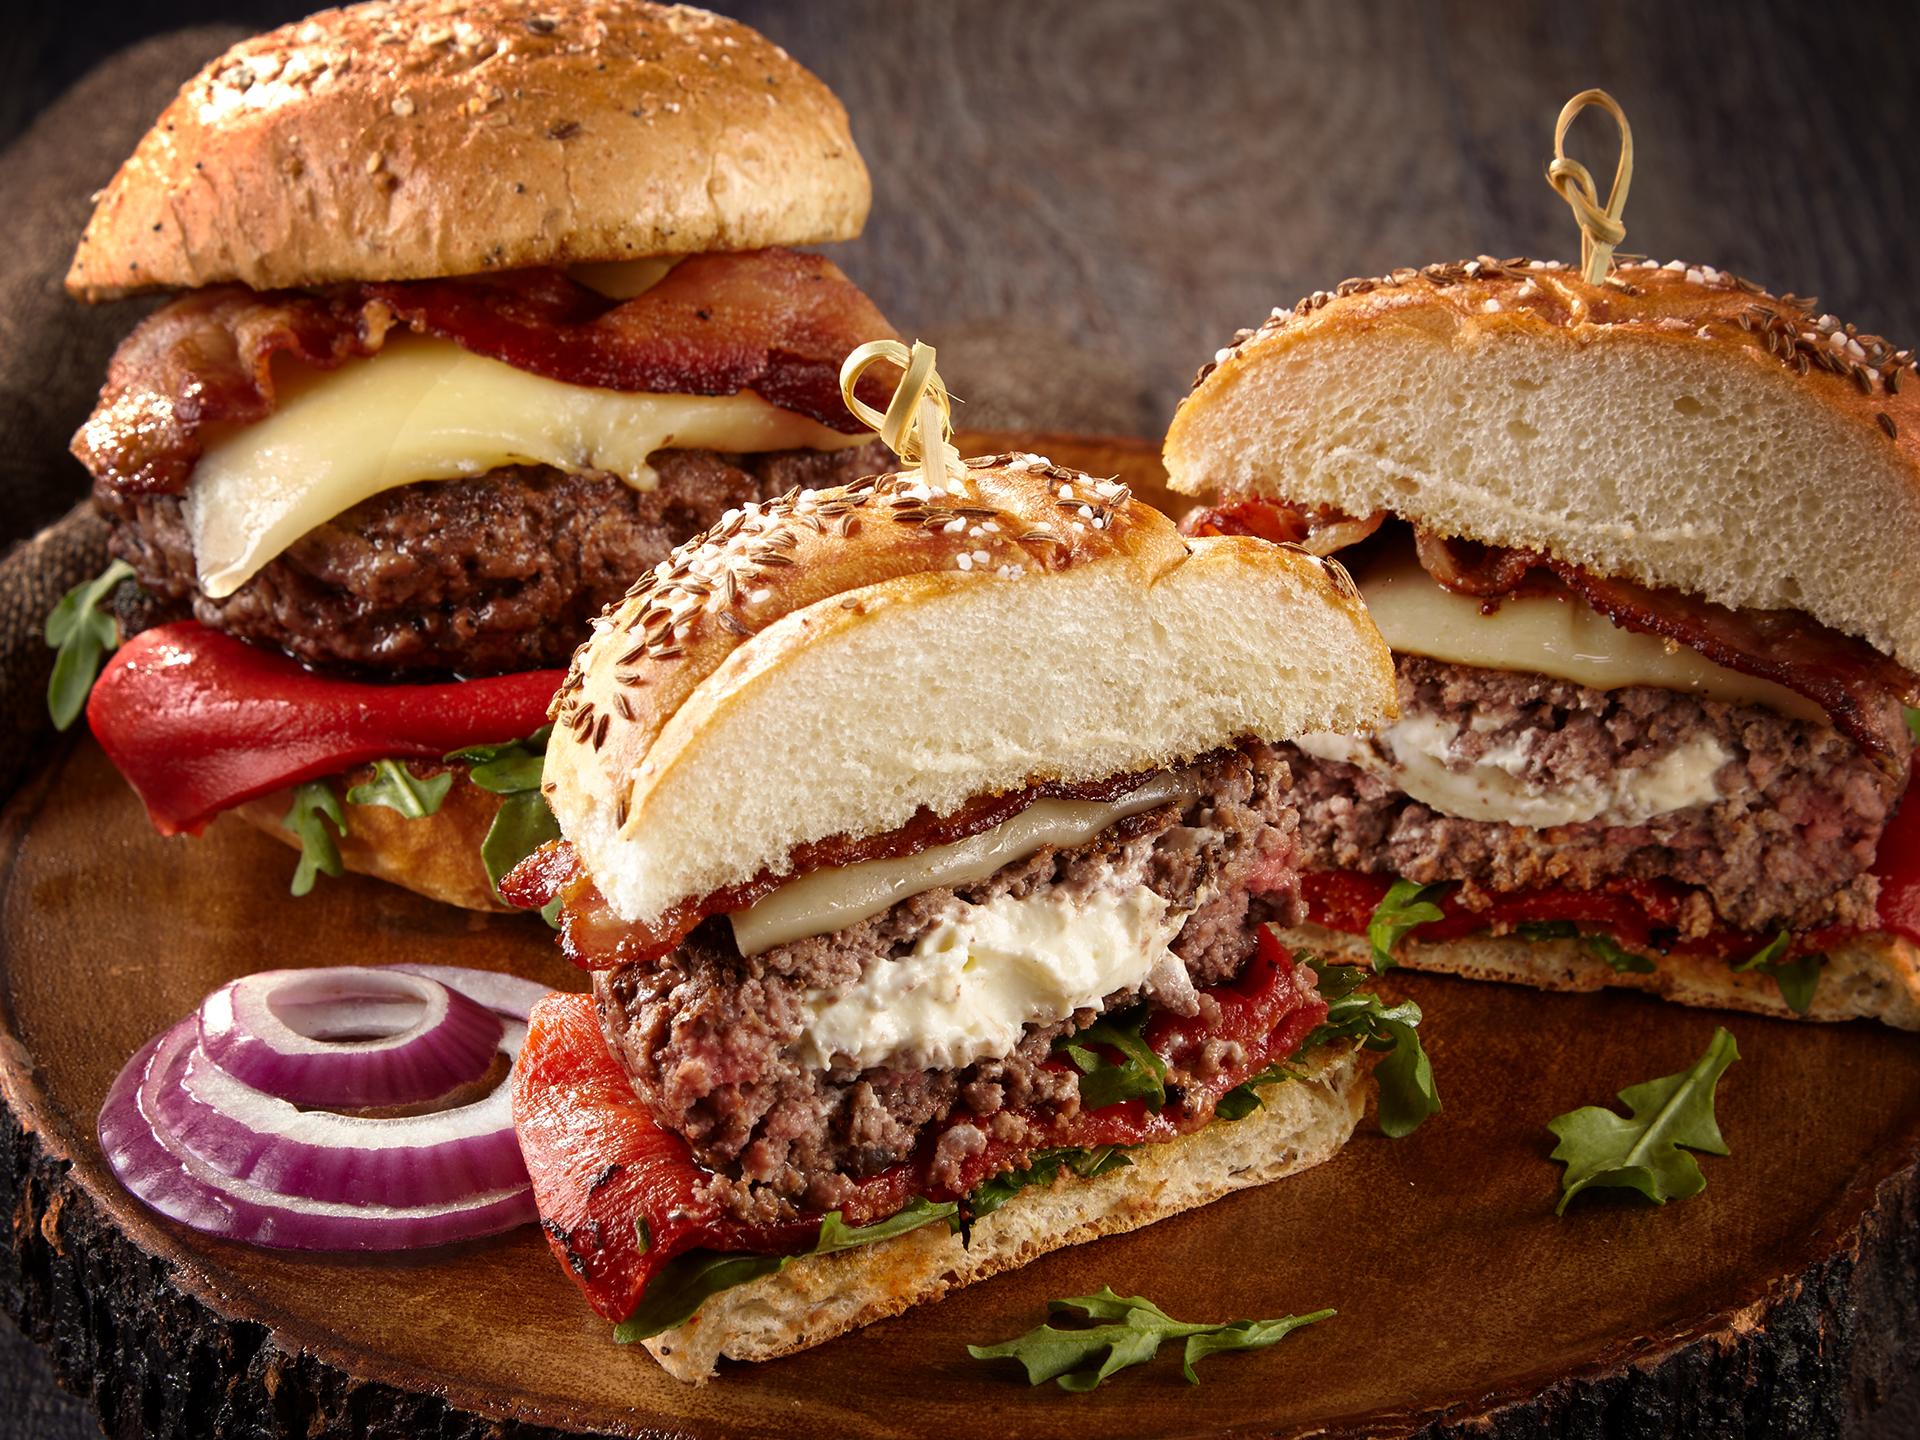 Stuffed Feta Burgers